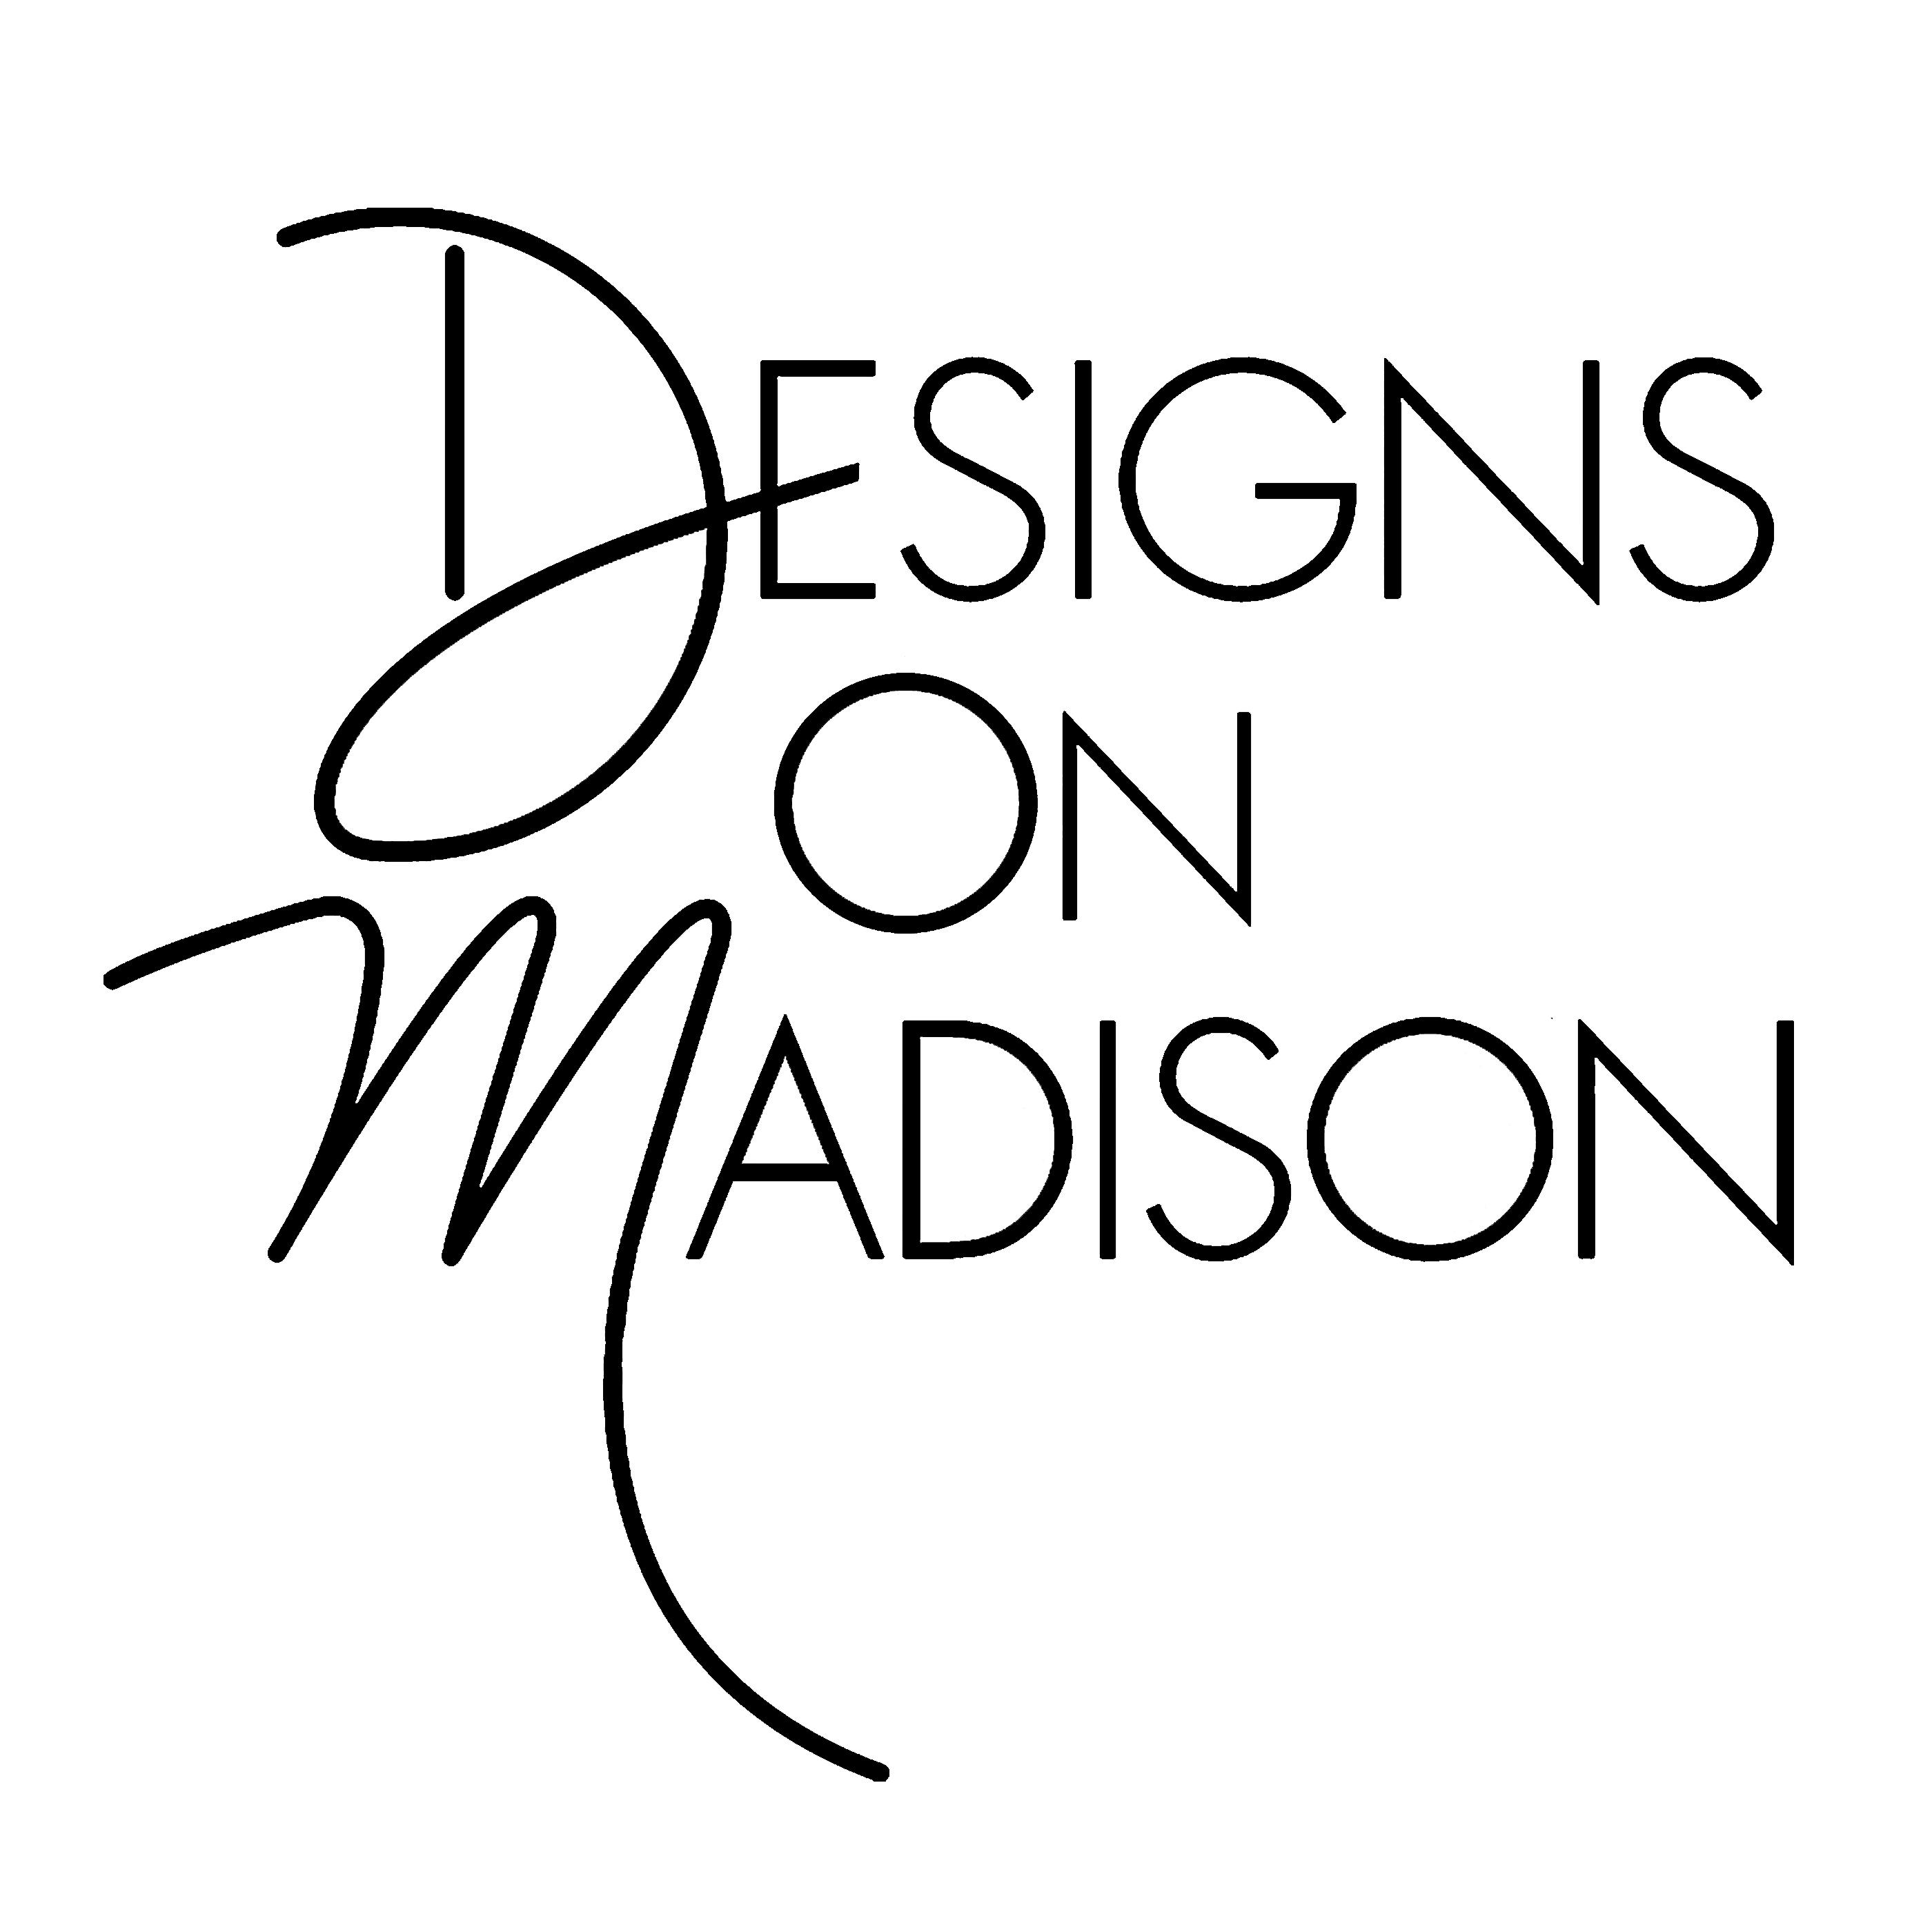 Designs on Madison logo